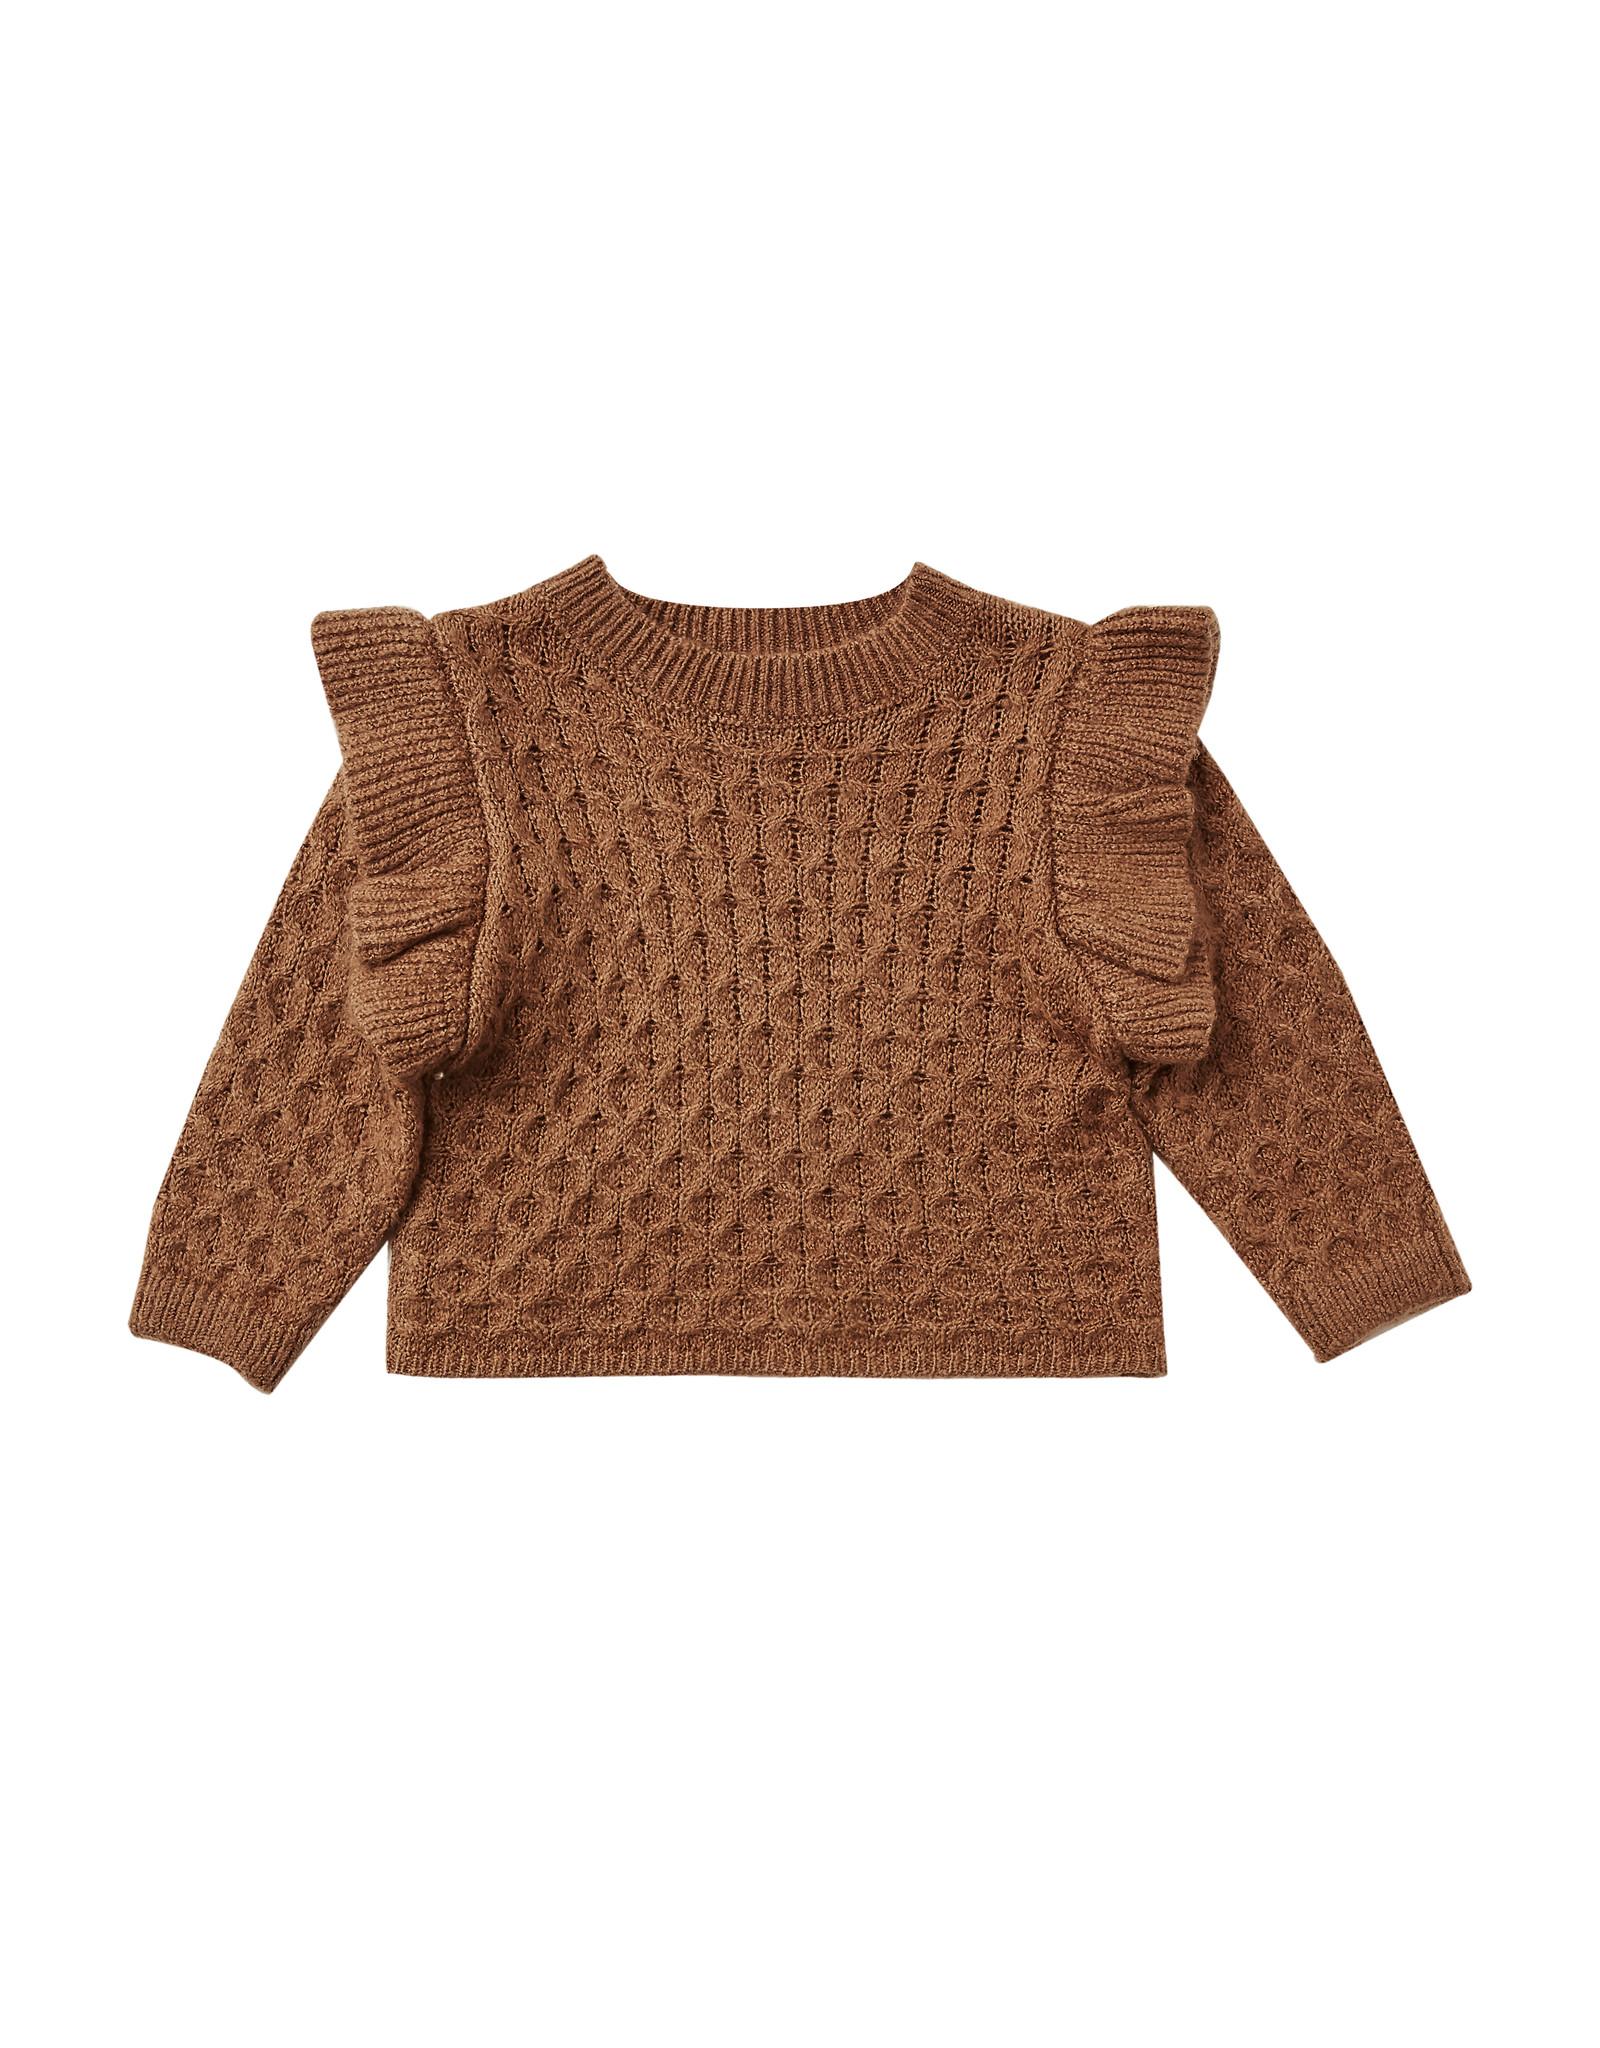 Rylee + Cru La Reina Sweater